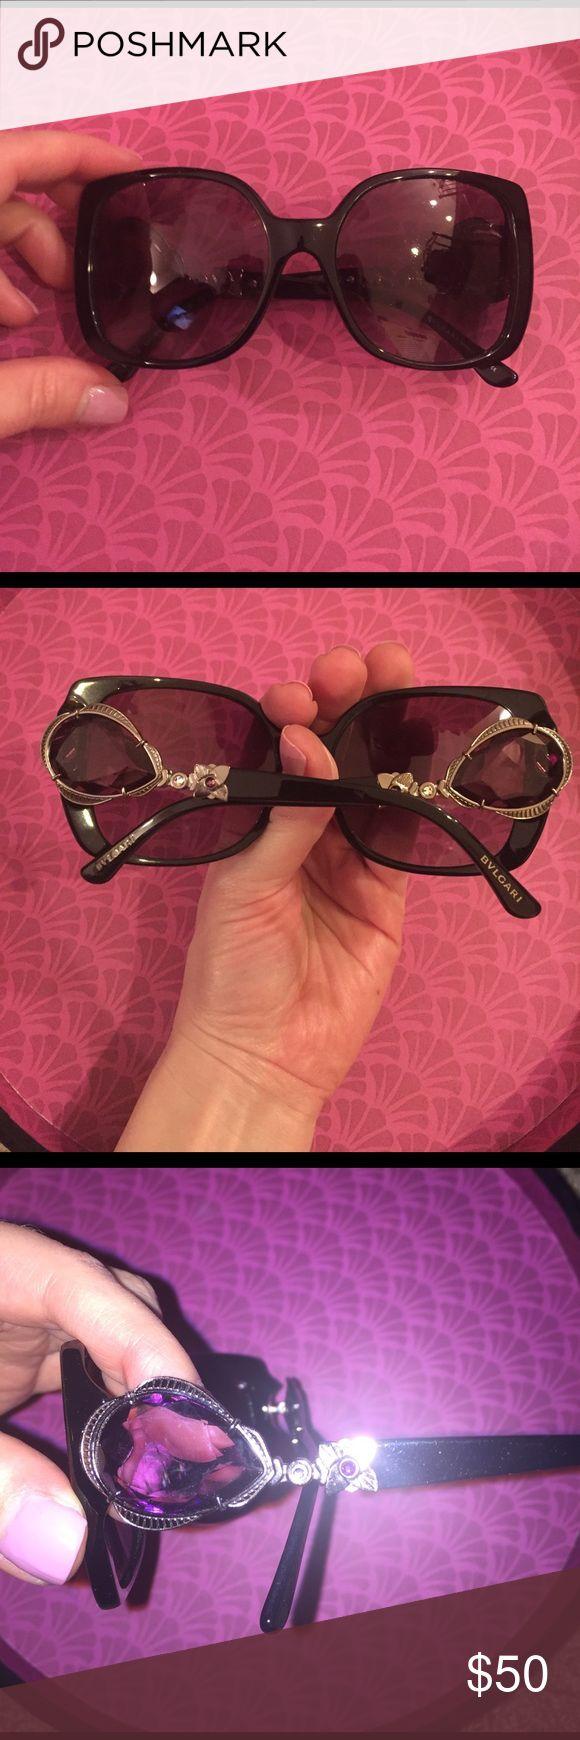 Great square frame Bvlgari glasses Bvlgari glasses square frame with purple stones on the side bvlgari Accessories Glasses